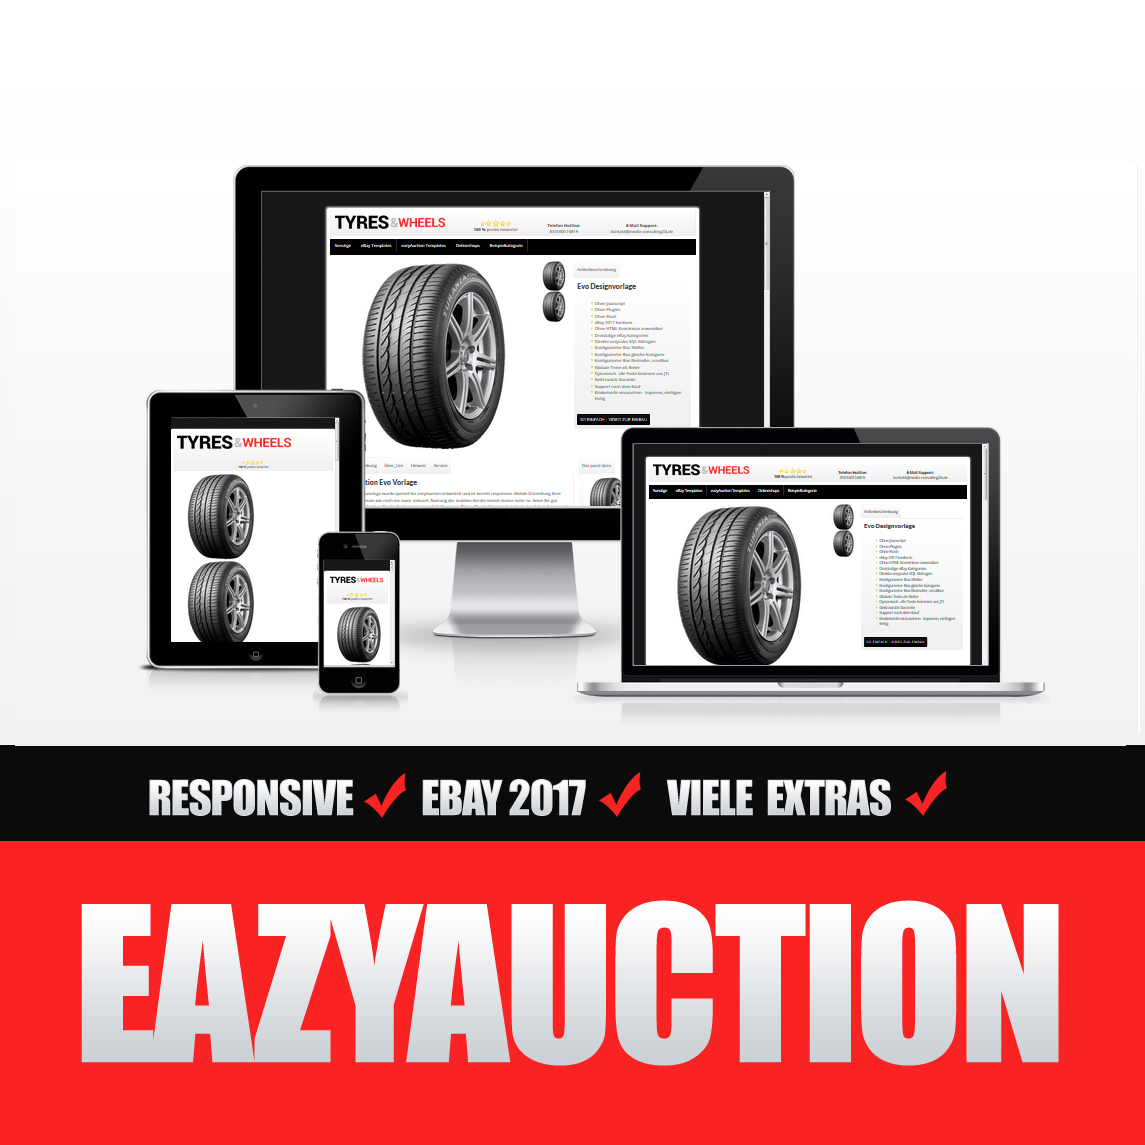 Eazyauction eBay Template 2017 #2-7